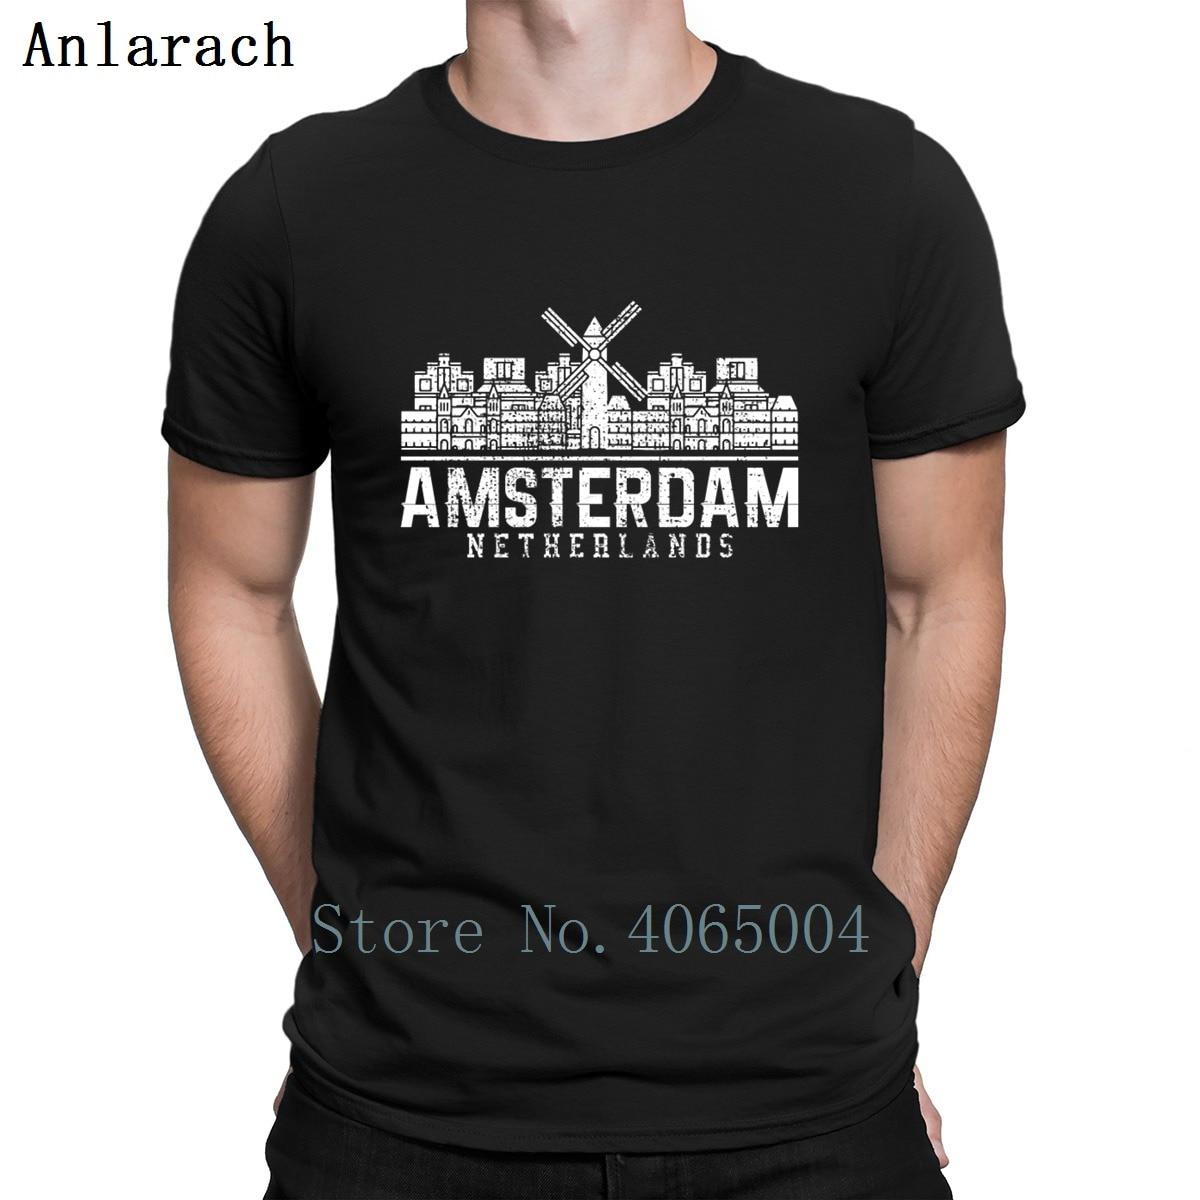 Amsterdam Holland Netherlands Windmill   T     Shirt   Euro Size S-3xl Natural Summer Style Letters Tee   Shirt   Basic Customized   Shirt